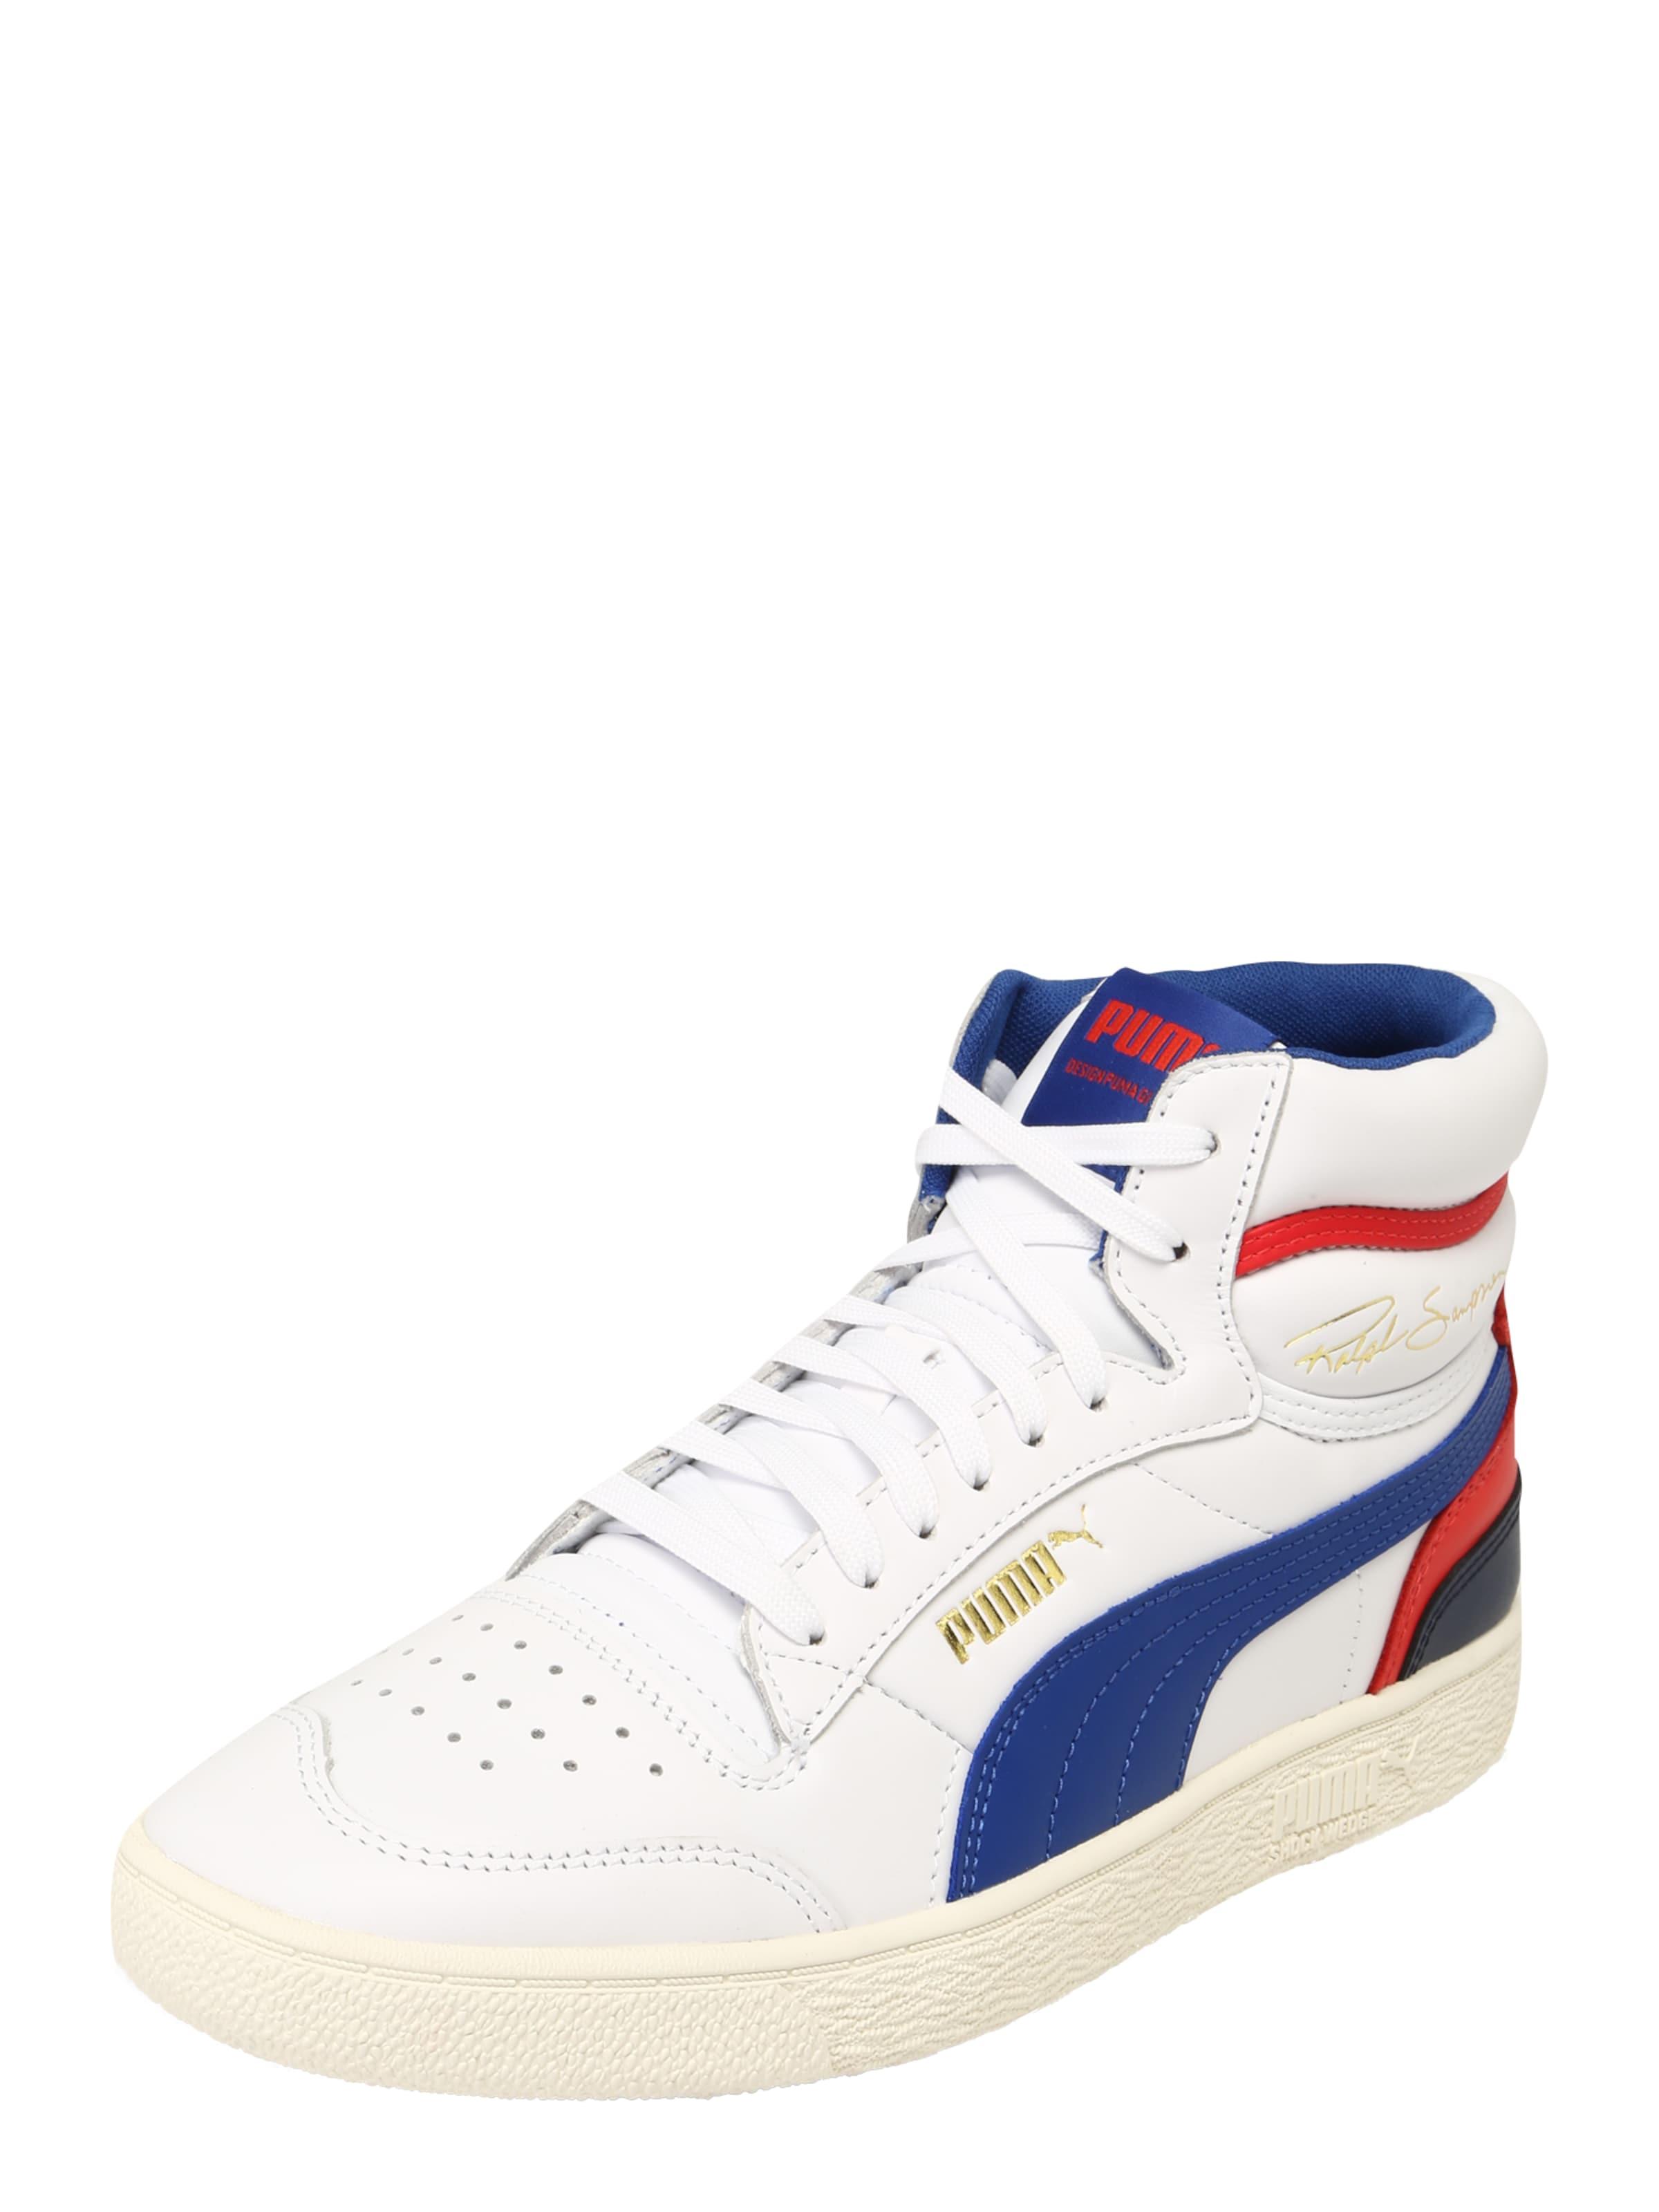 En Blanc Baskets Hautes Blanc Puma Hautes Puma Baskets Puma Baskets Hautes En zVqUMGpS